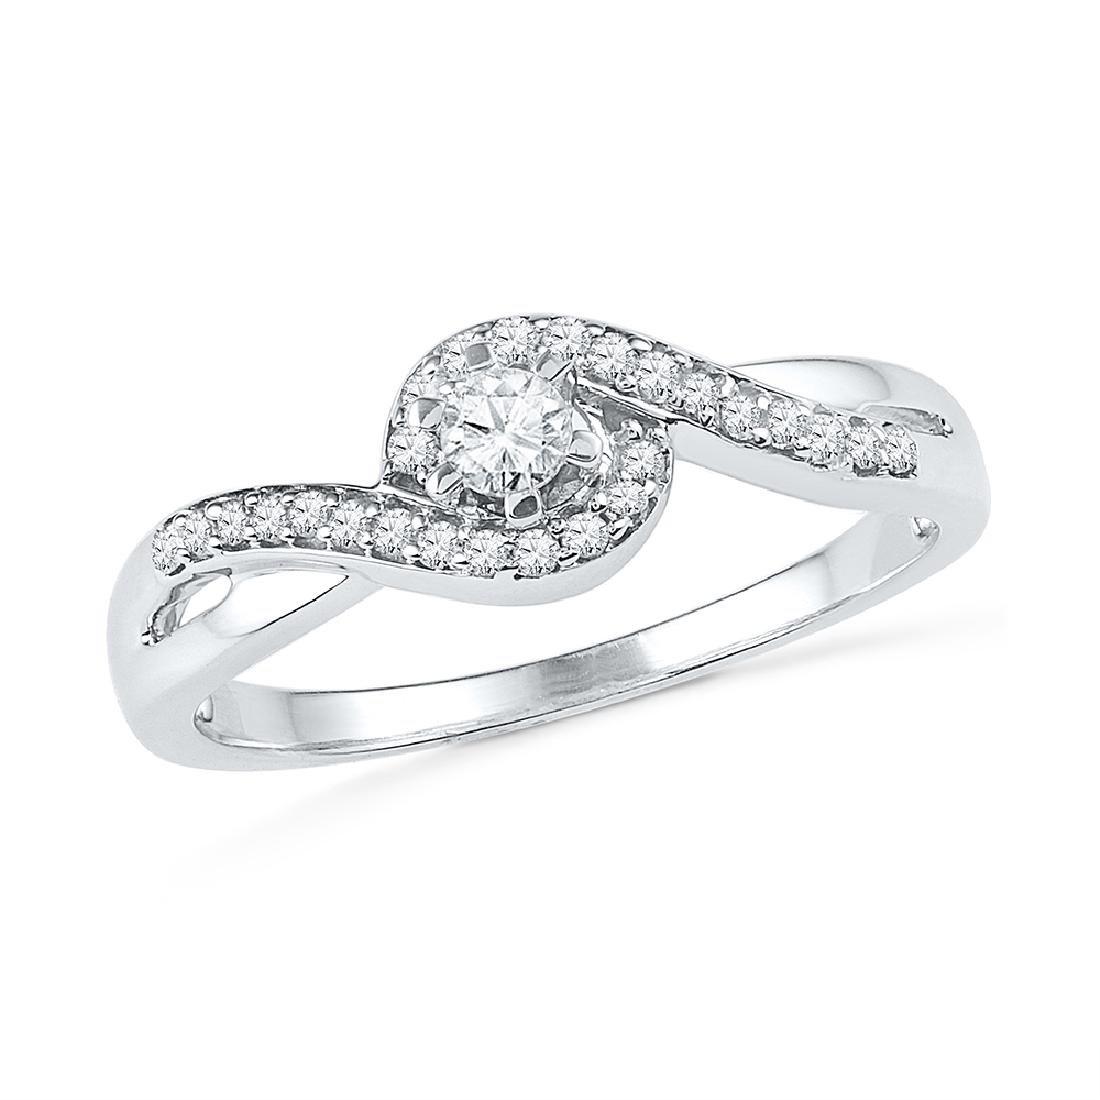 0.20 CTW Diamond Solitaire Swirl Promise Bridal Ring